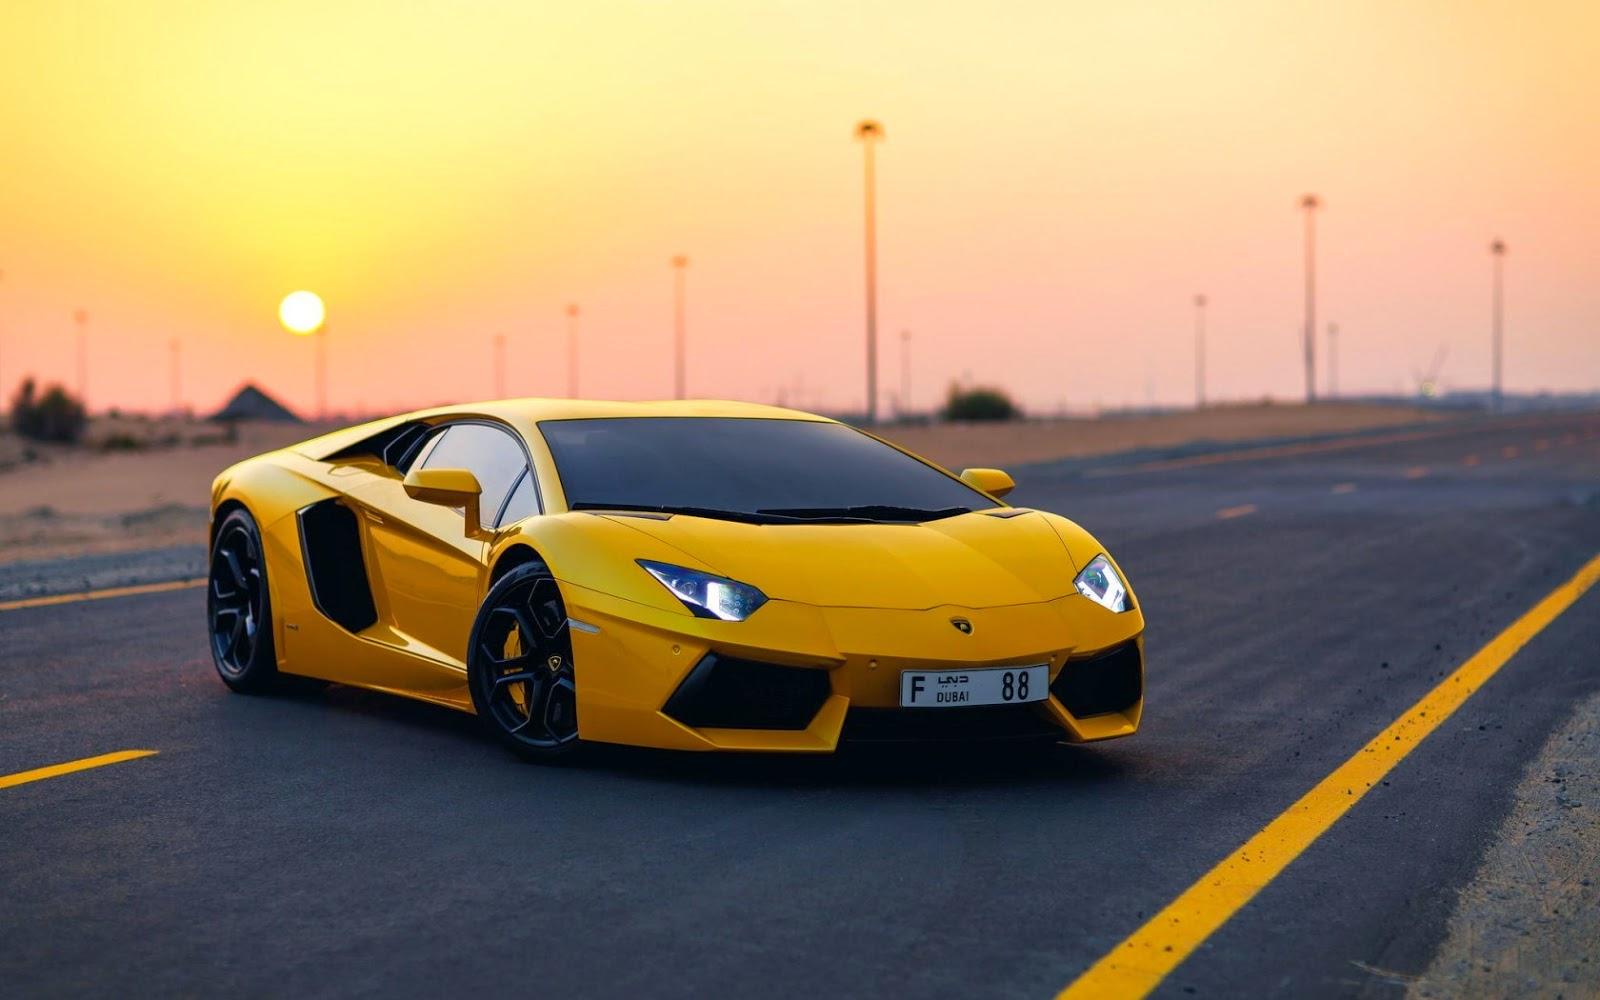 mobil lamborghini kuning